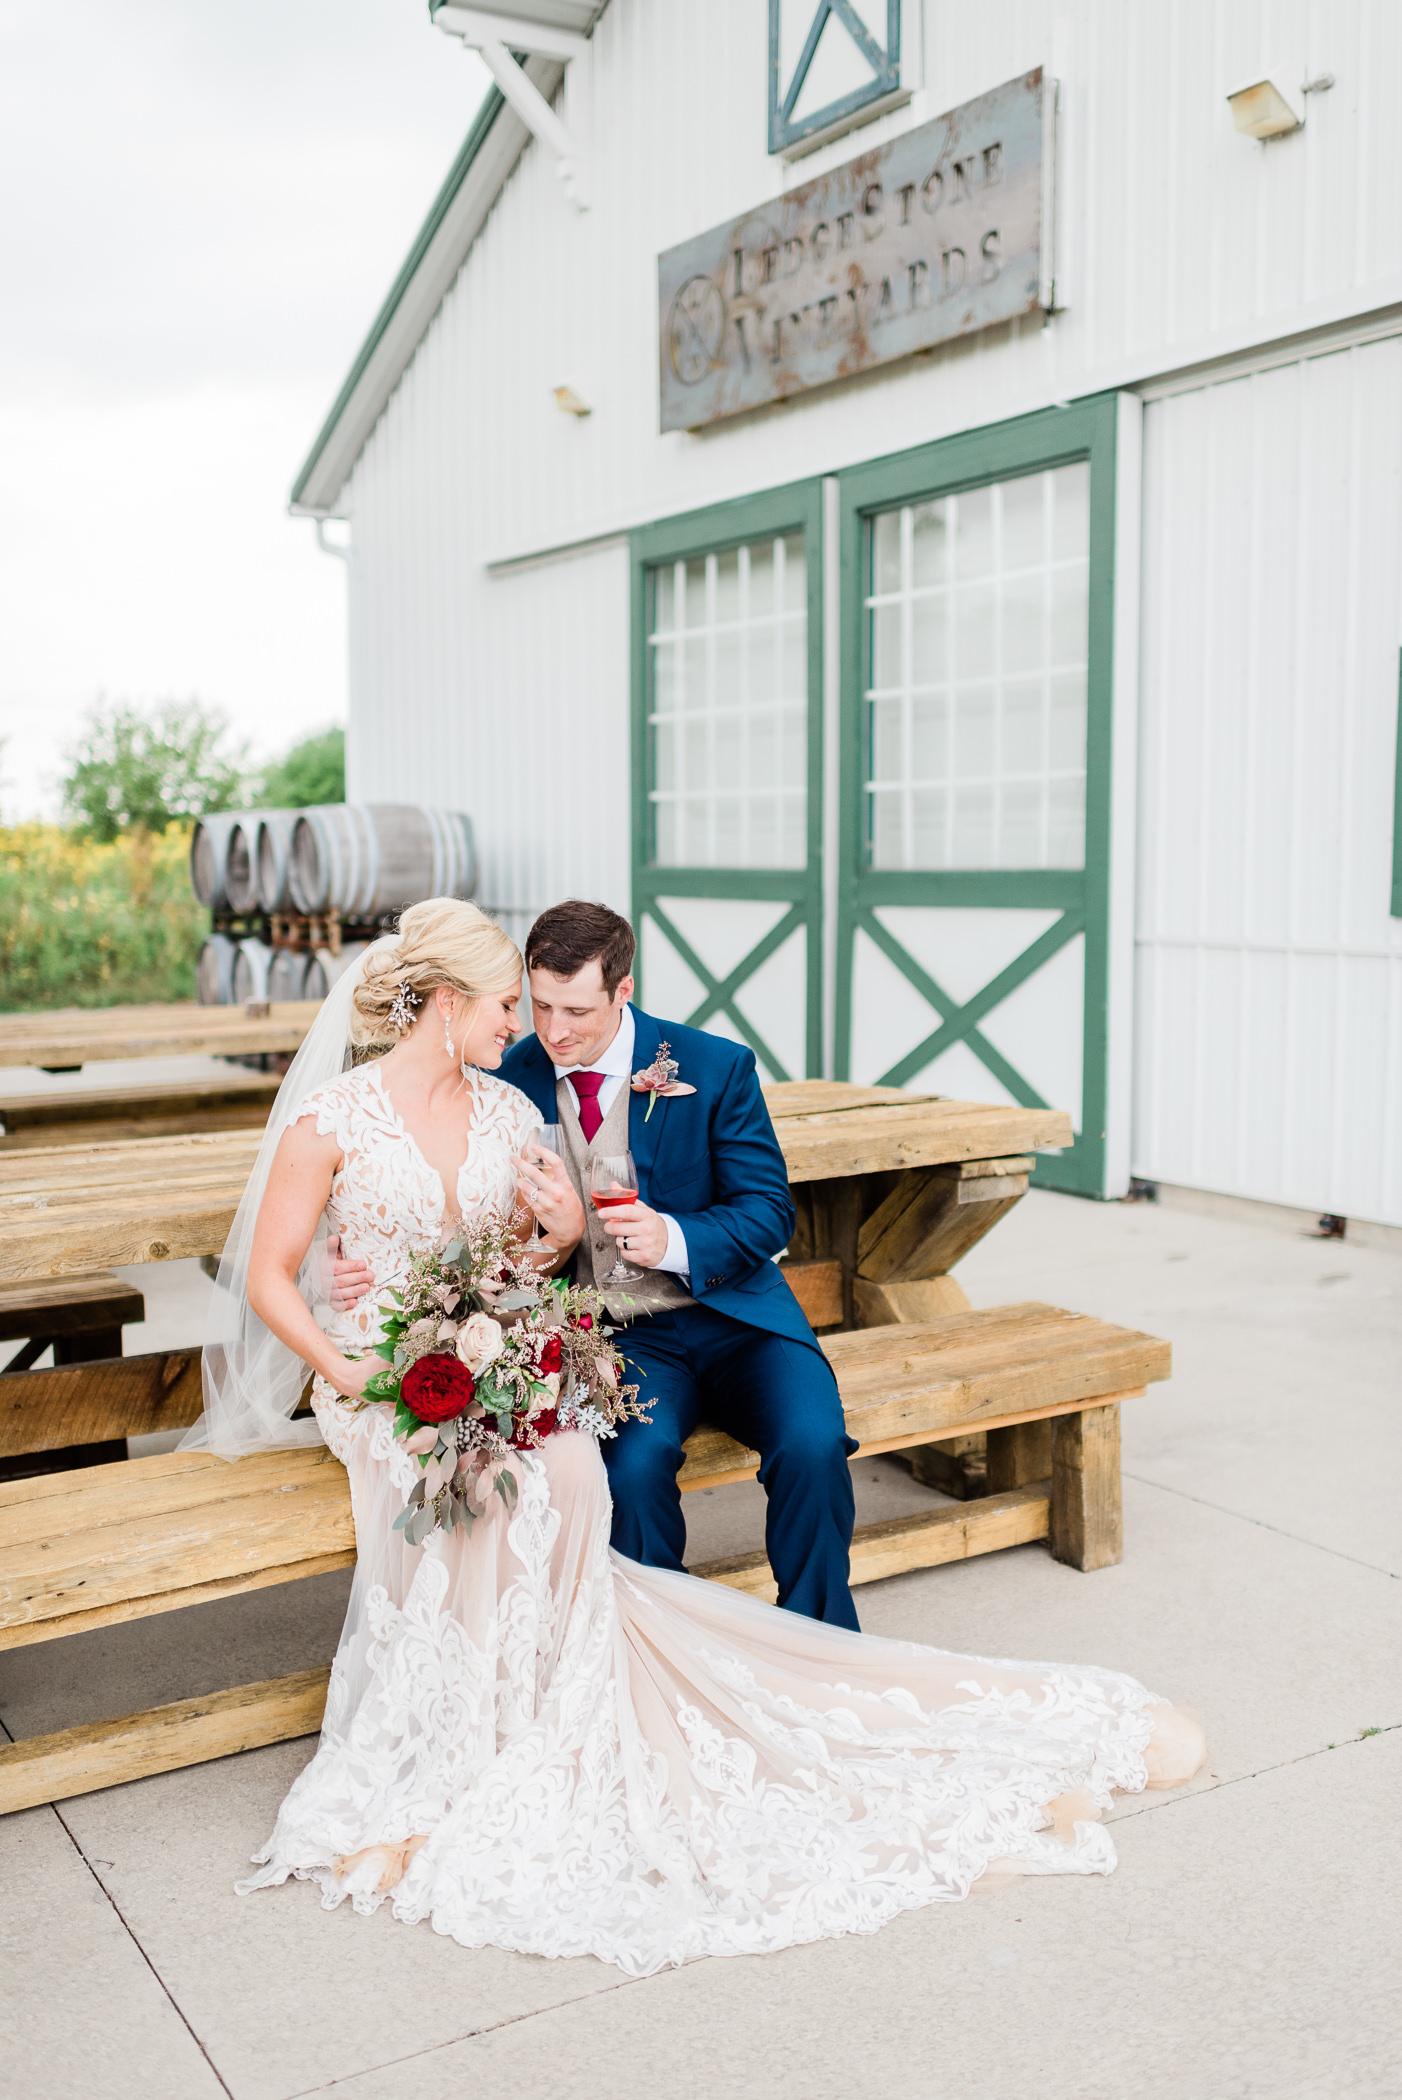 Olde 41 Green Bay, WI Wedding Photographers - Larissa Marie Photography